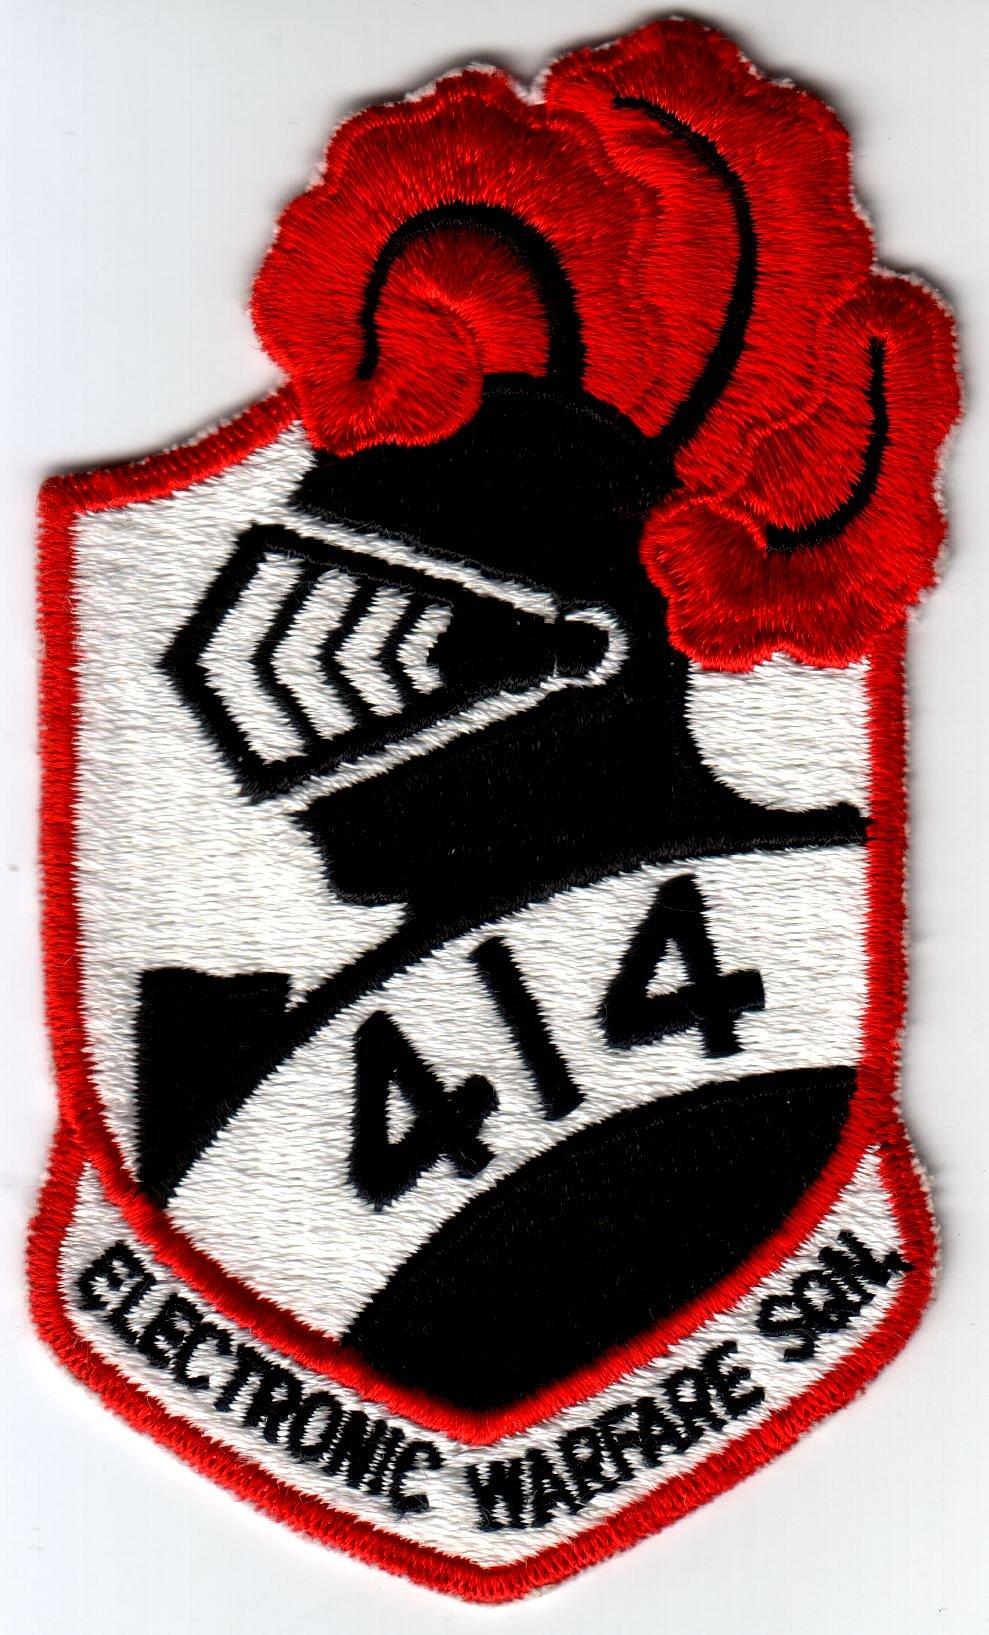 414 Squadron RCAF - Wikidata